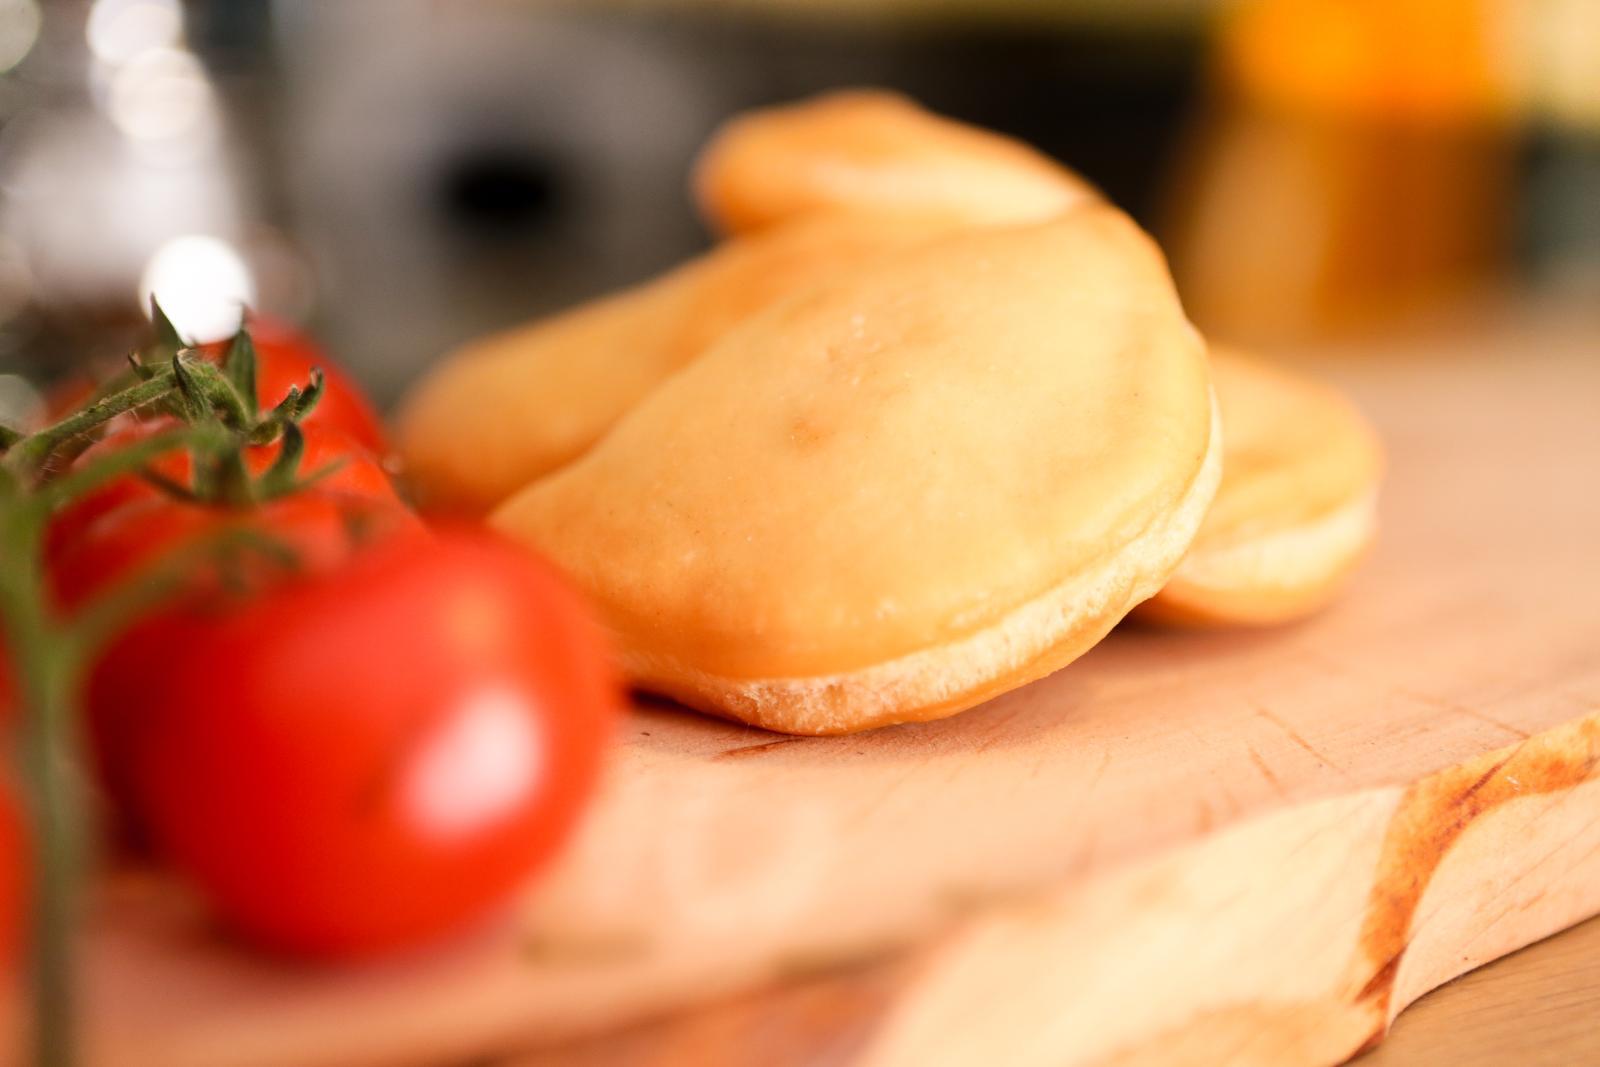 Sito web Settore Food Surgelati: Surgelgrotte - Maingage, Web Agency Bari